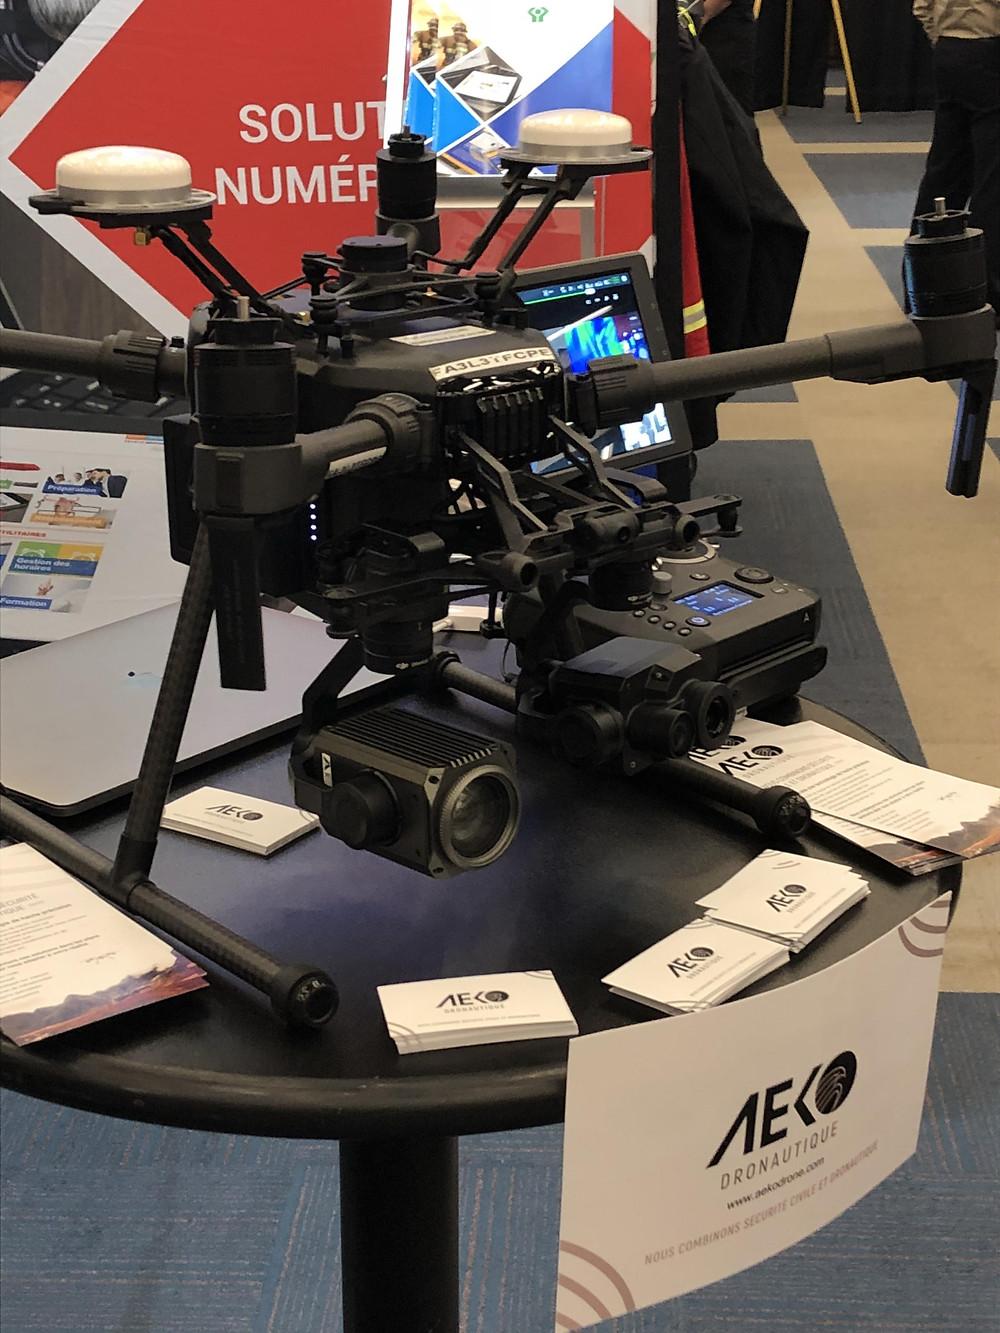 Drone M210 RTK d'AEKO Dronautique